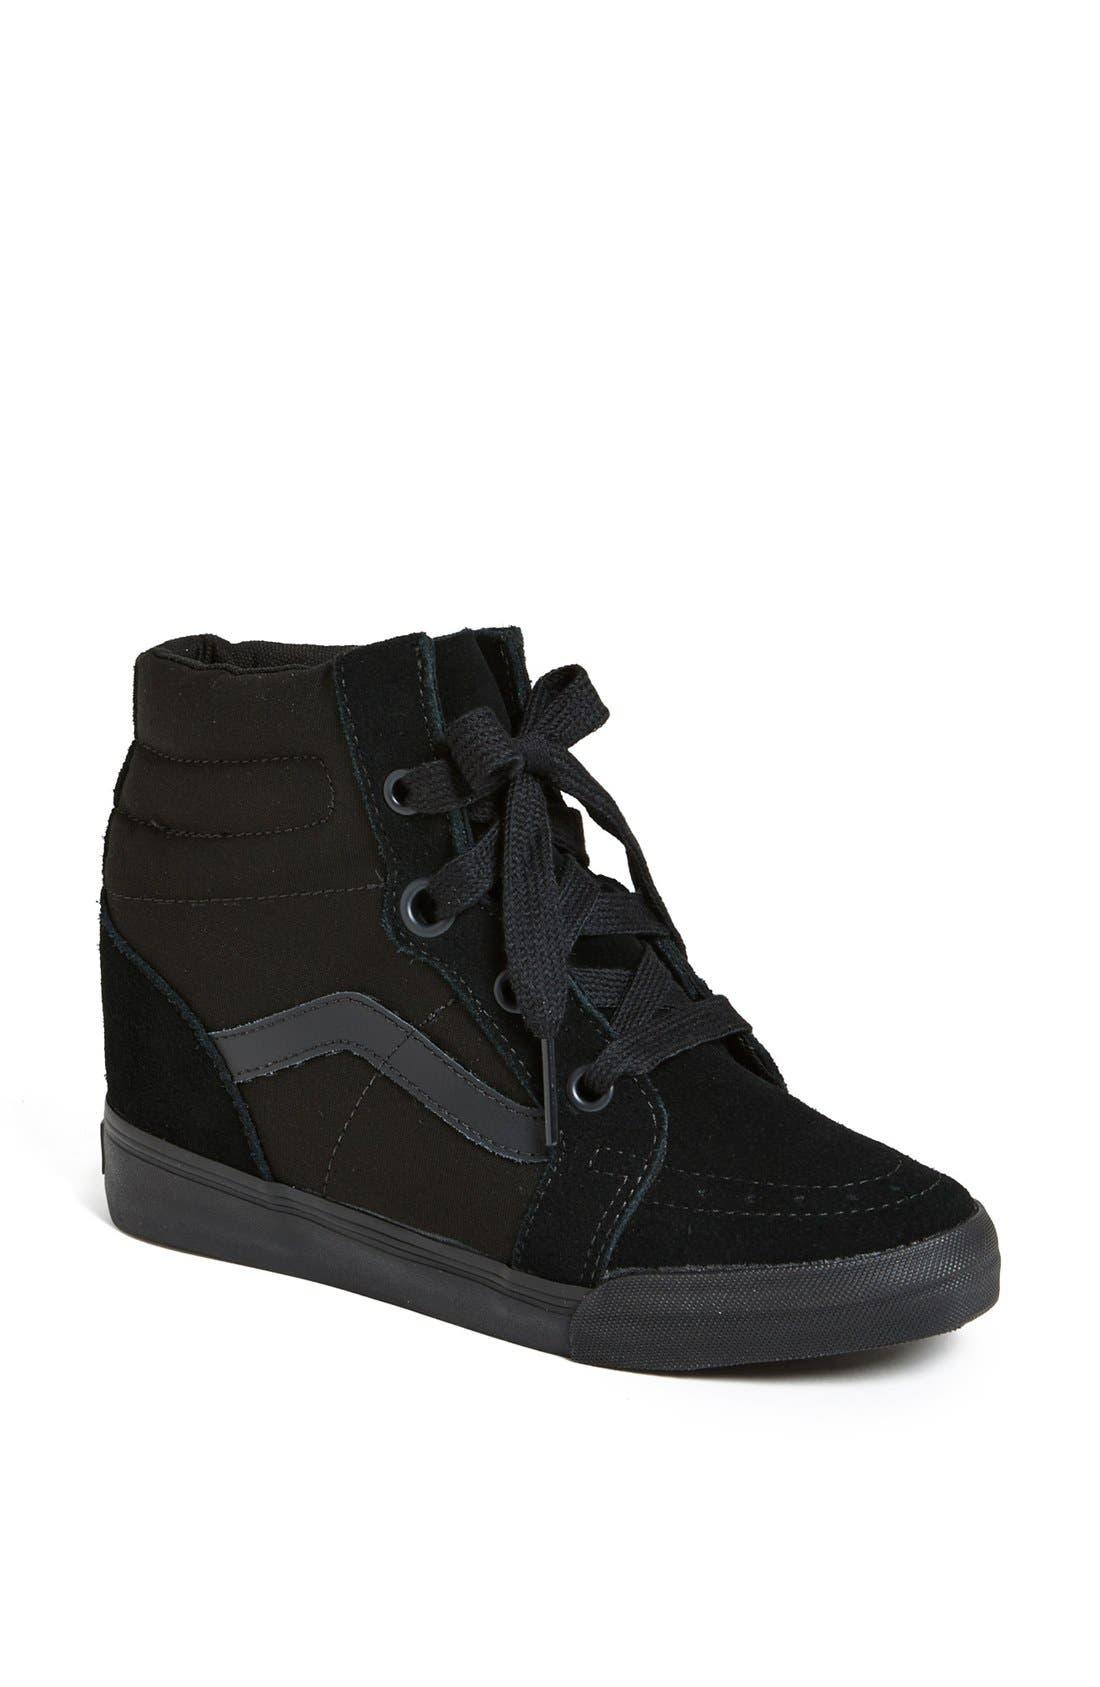 Main Image - Vans 'Sk8 Hi' Wedge Sneaker (Women)